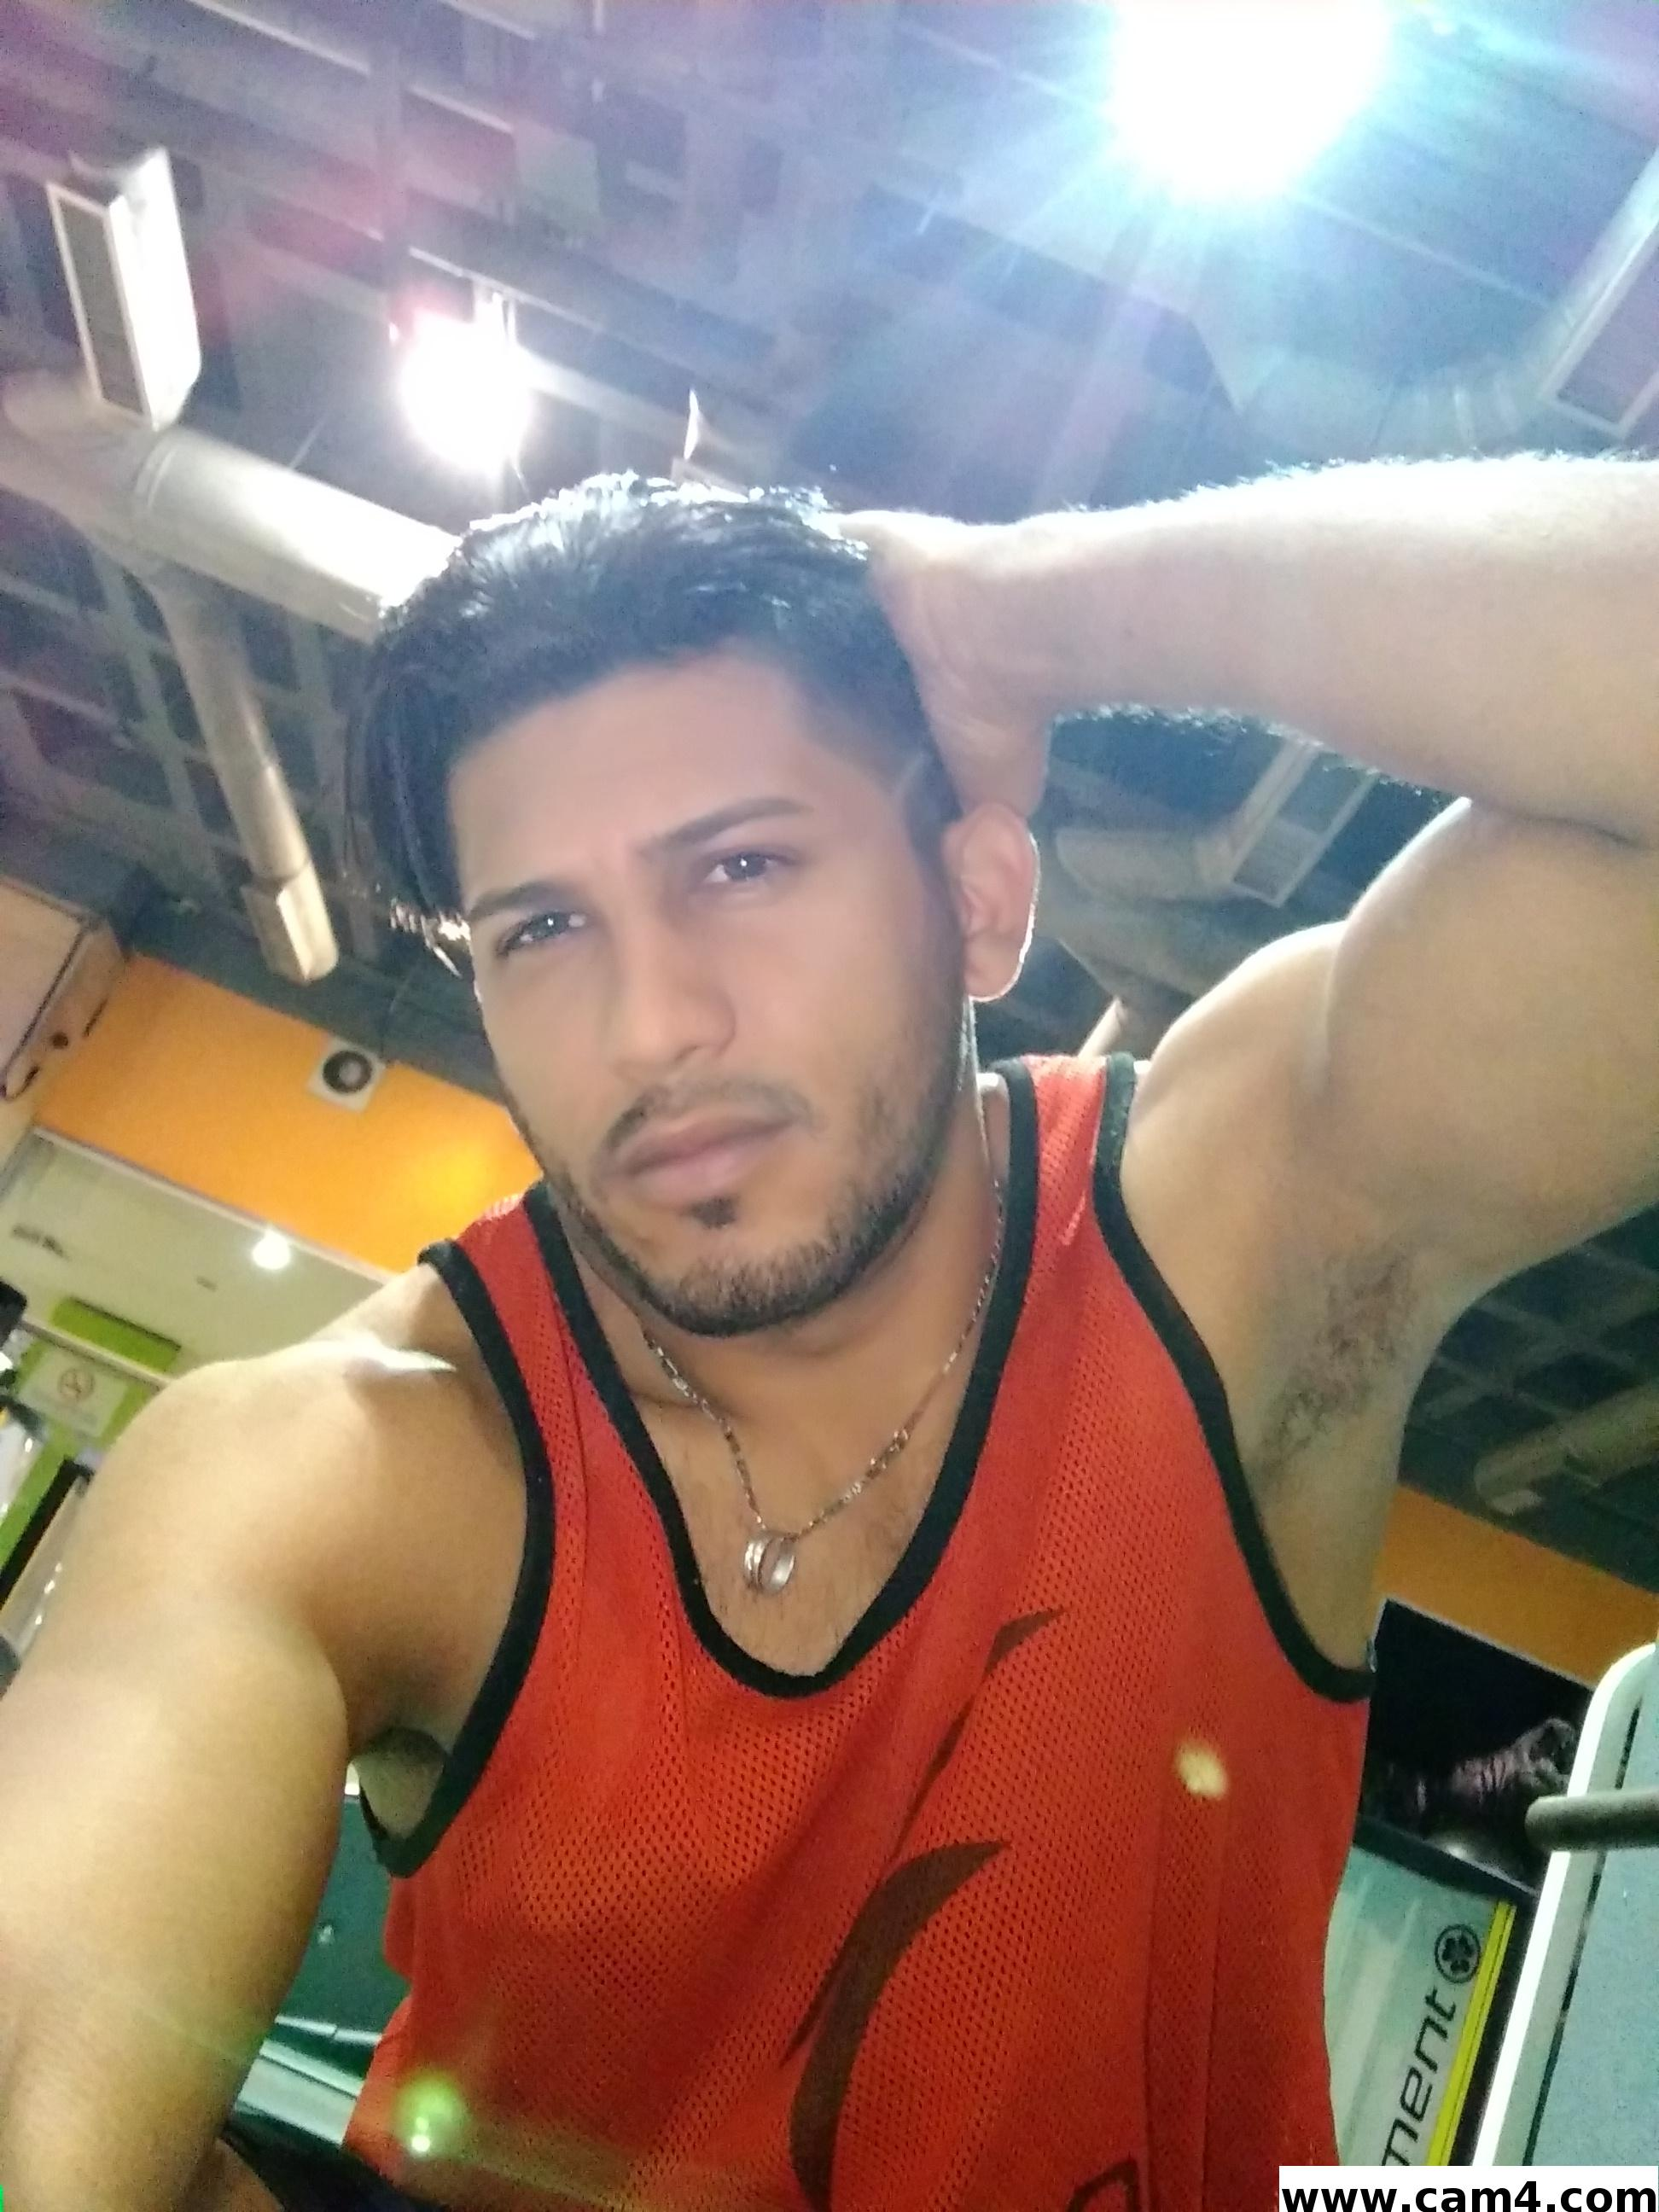 Ricardo0286?s=rv8k8ac40jc1snn2gbxfjlvsr+3yowreznlxvxxug9k=